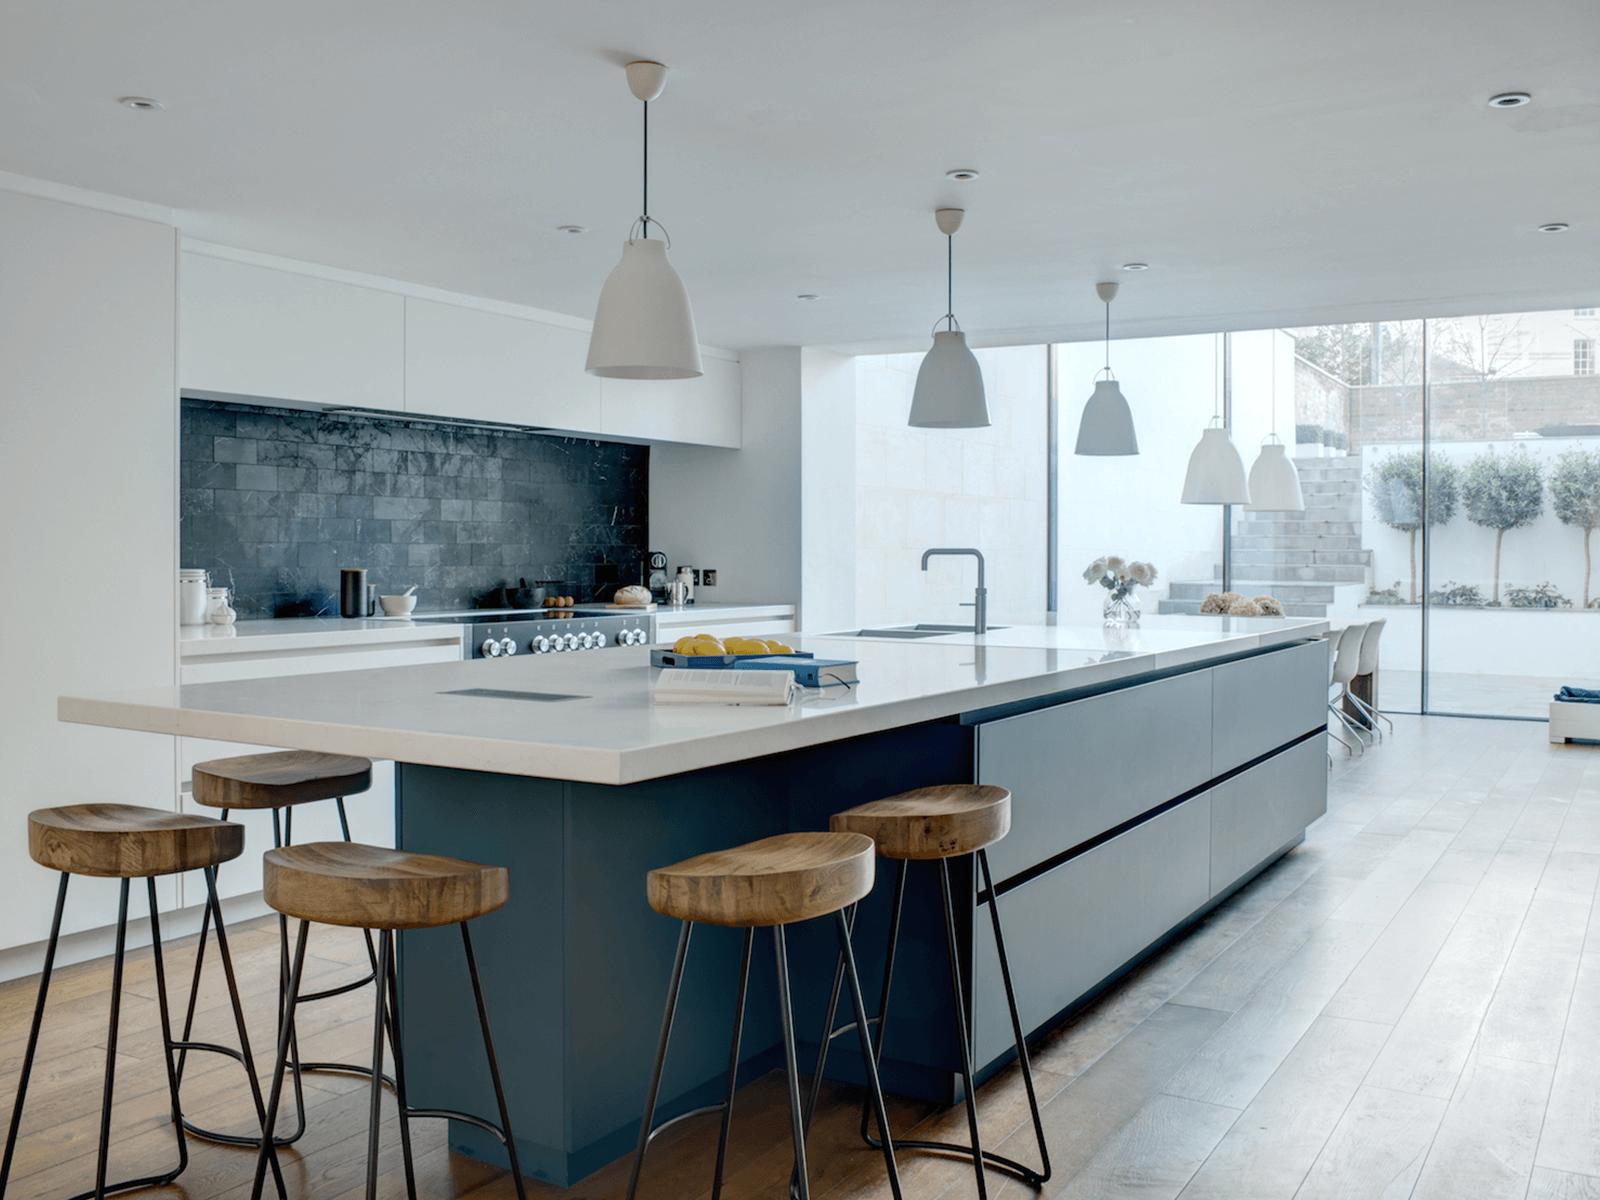 seating around kitchen Island - Task Masters, Dubai